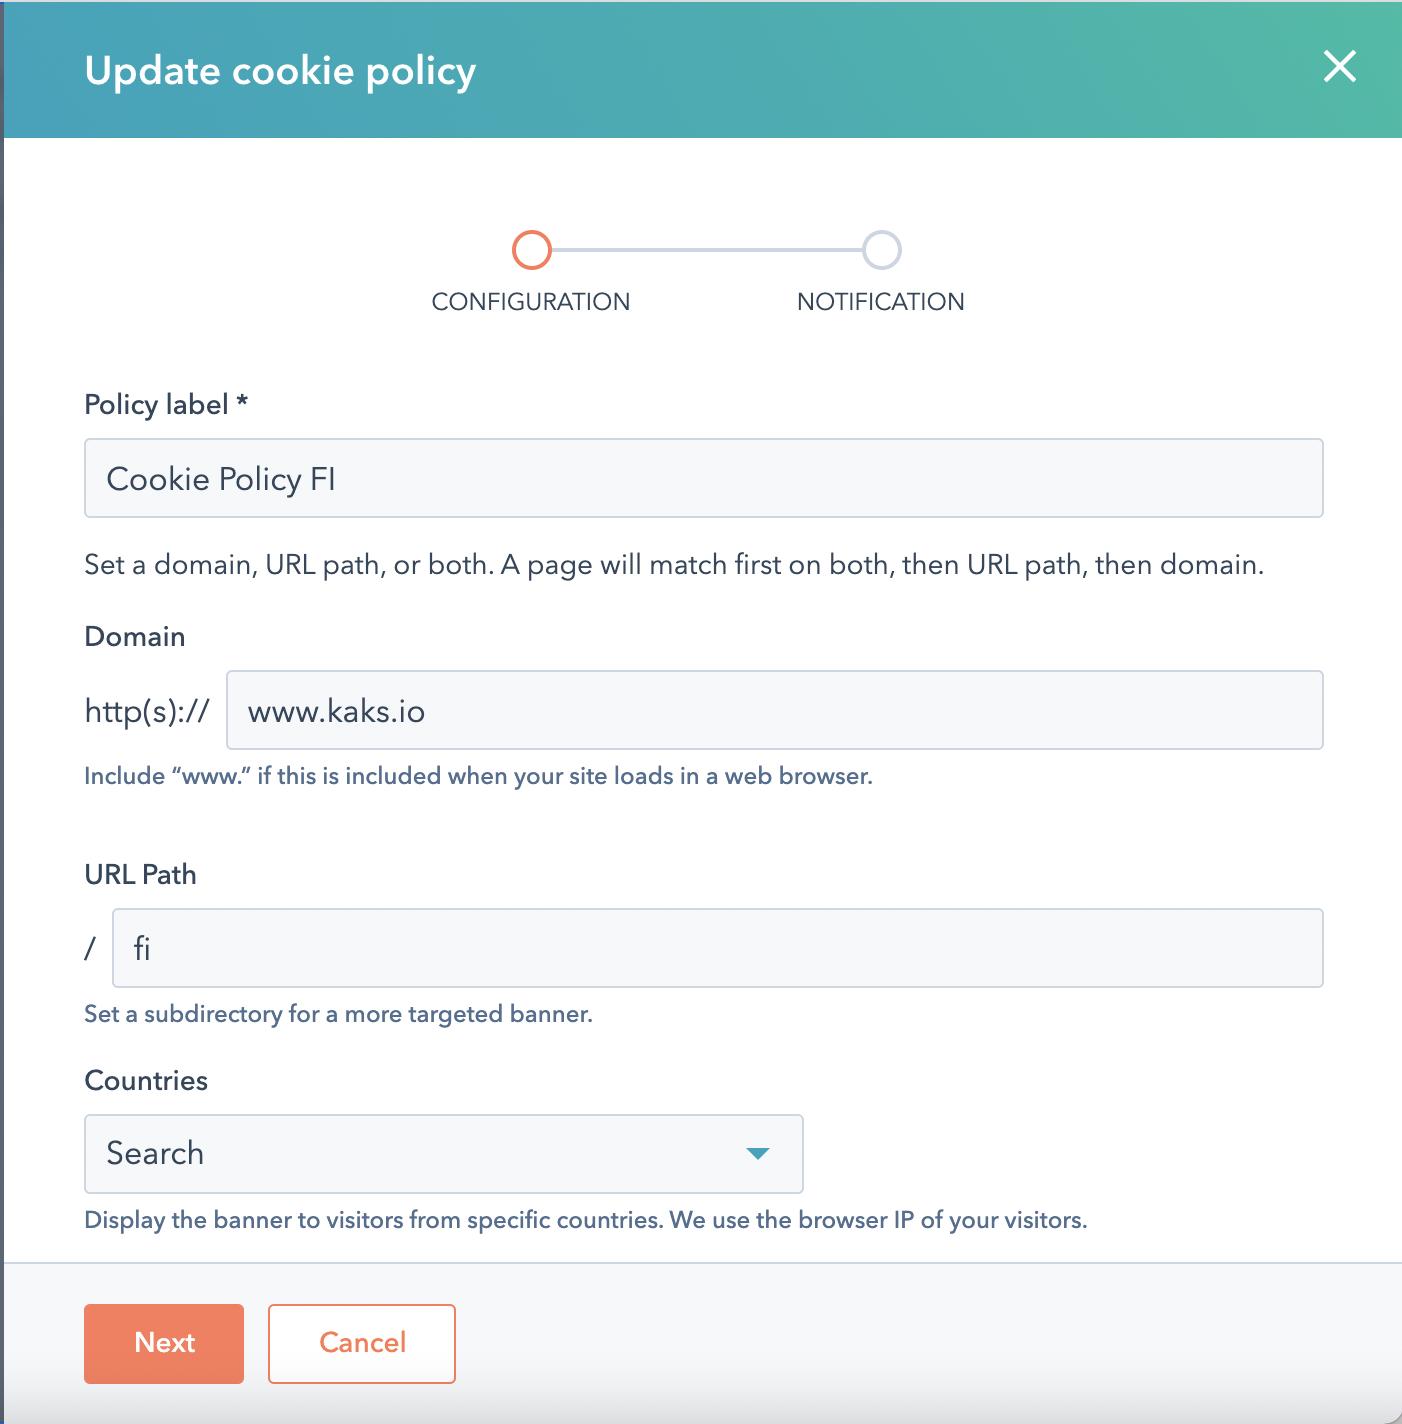 Geotrageting the cookie banner - hubspot updates june 21